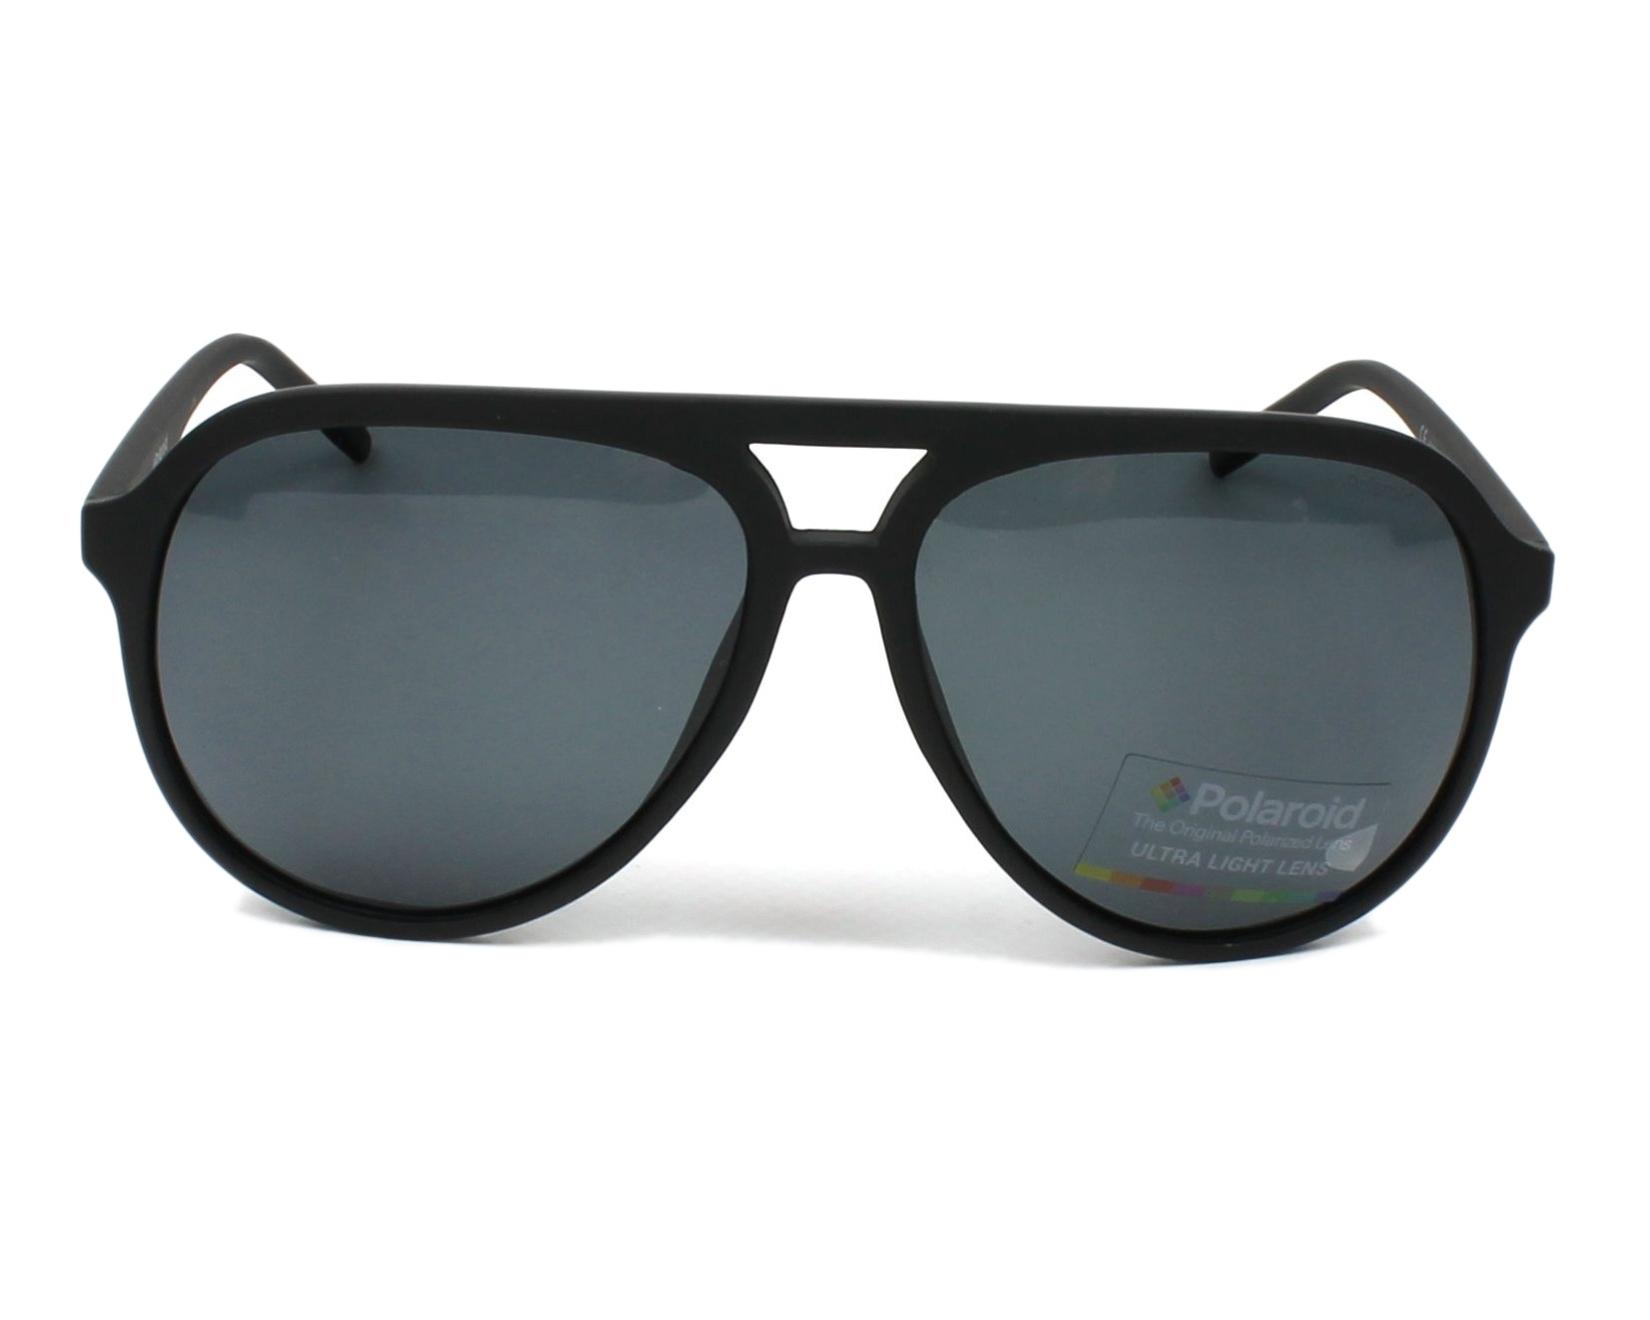 0c40cdfb0905 thumbnail Sunglasses Polaroid PLD-2048-S 003 M9 - Black front view